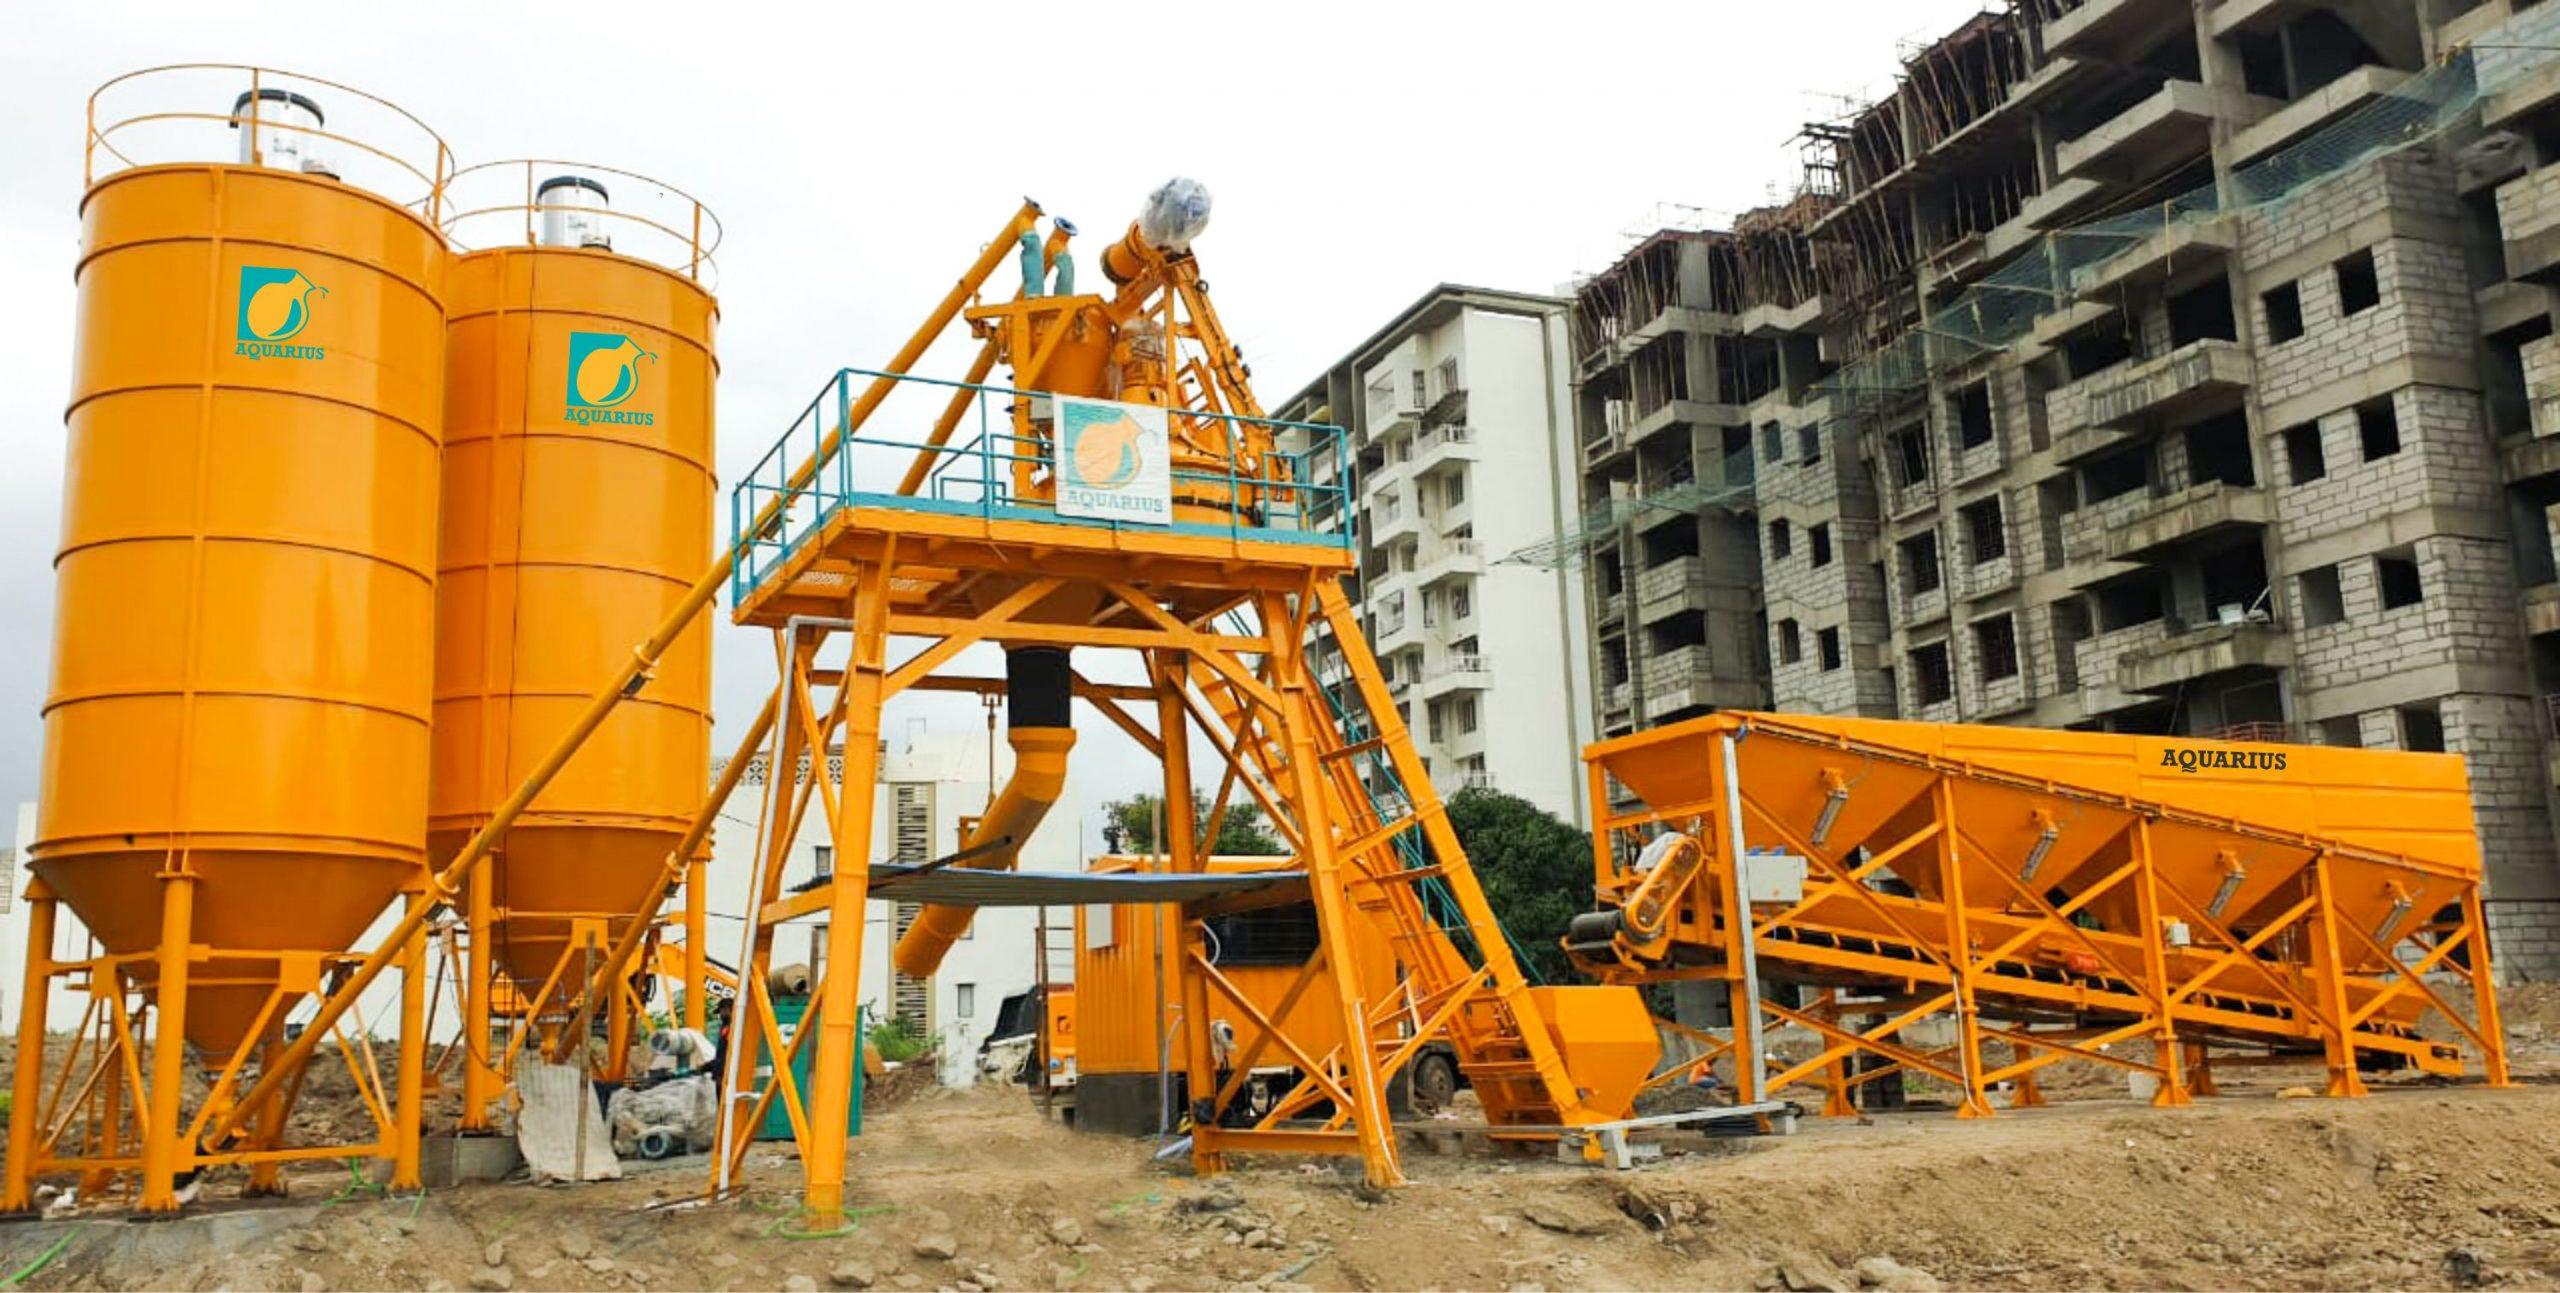 Aquarius SP 40 Batching Plant working at Sarsan Aawishkar Properties, Pune for Housing Project